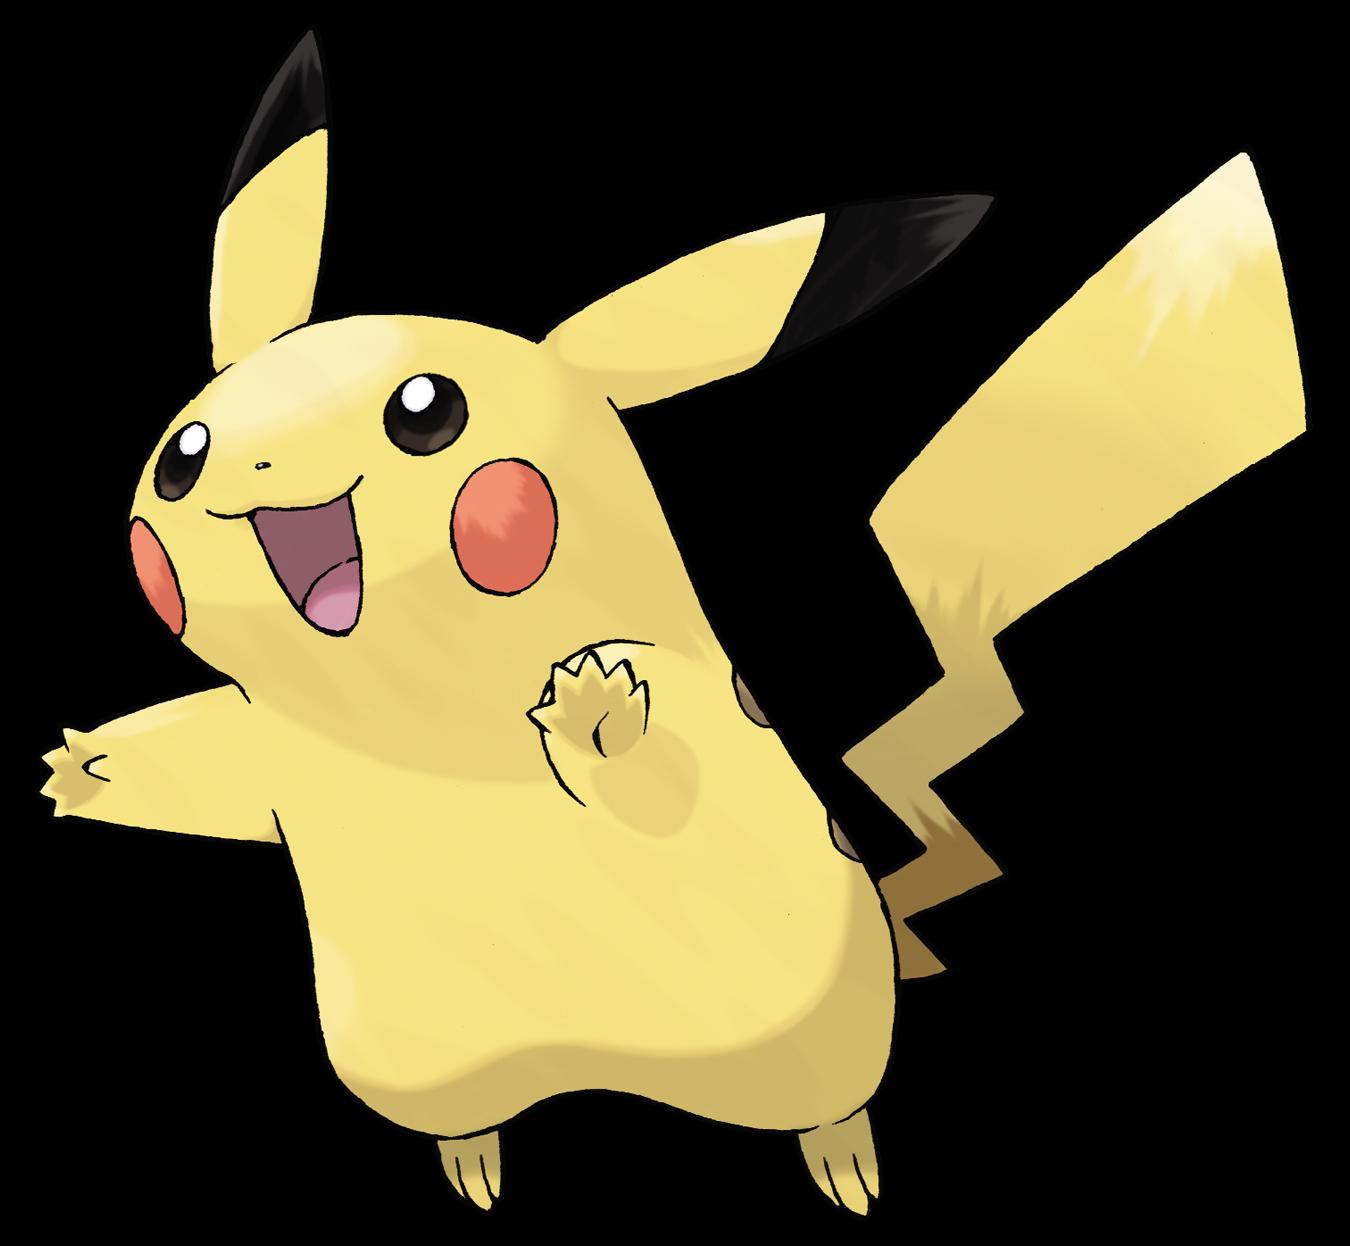 Archivo:Pikachu.png